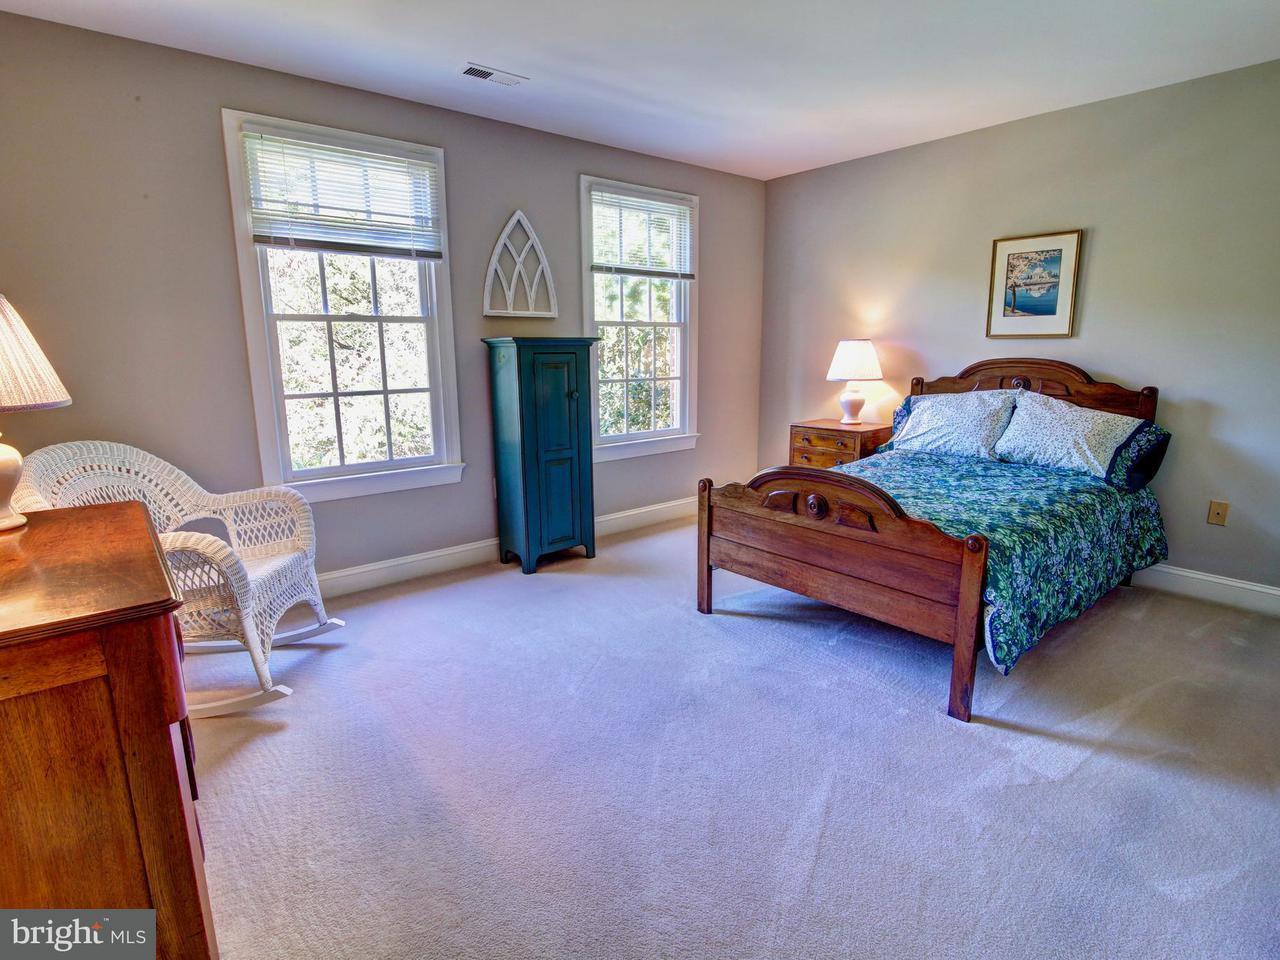 Additional photo for property listing at 3891 CLIFTON MANOR Place 3891 CLIFTON MANOR Place Haymarket, Βιρτζινια 20169 Ηνωμενεσ Πολιτειεσ